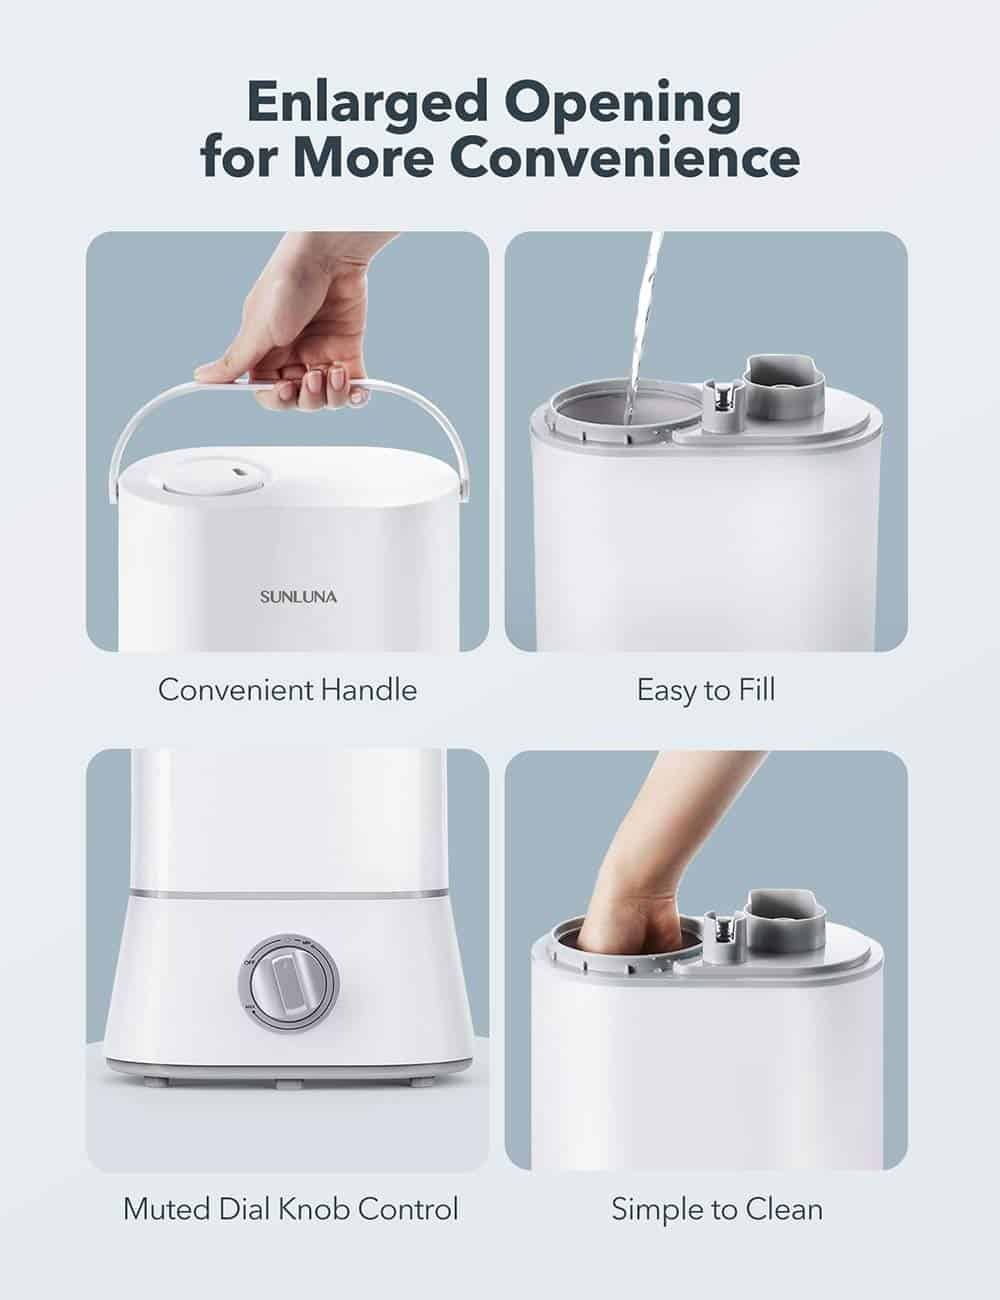 Sunluna SL-AH001 Cool Mist Ultrasonic Humidifier for Baby Review